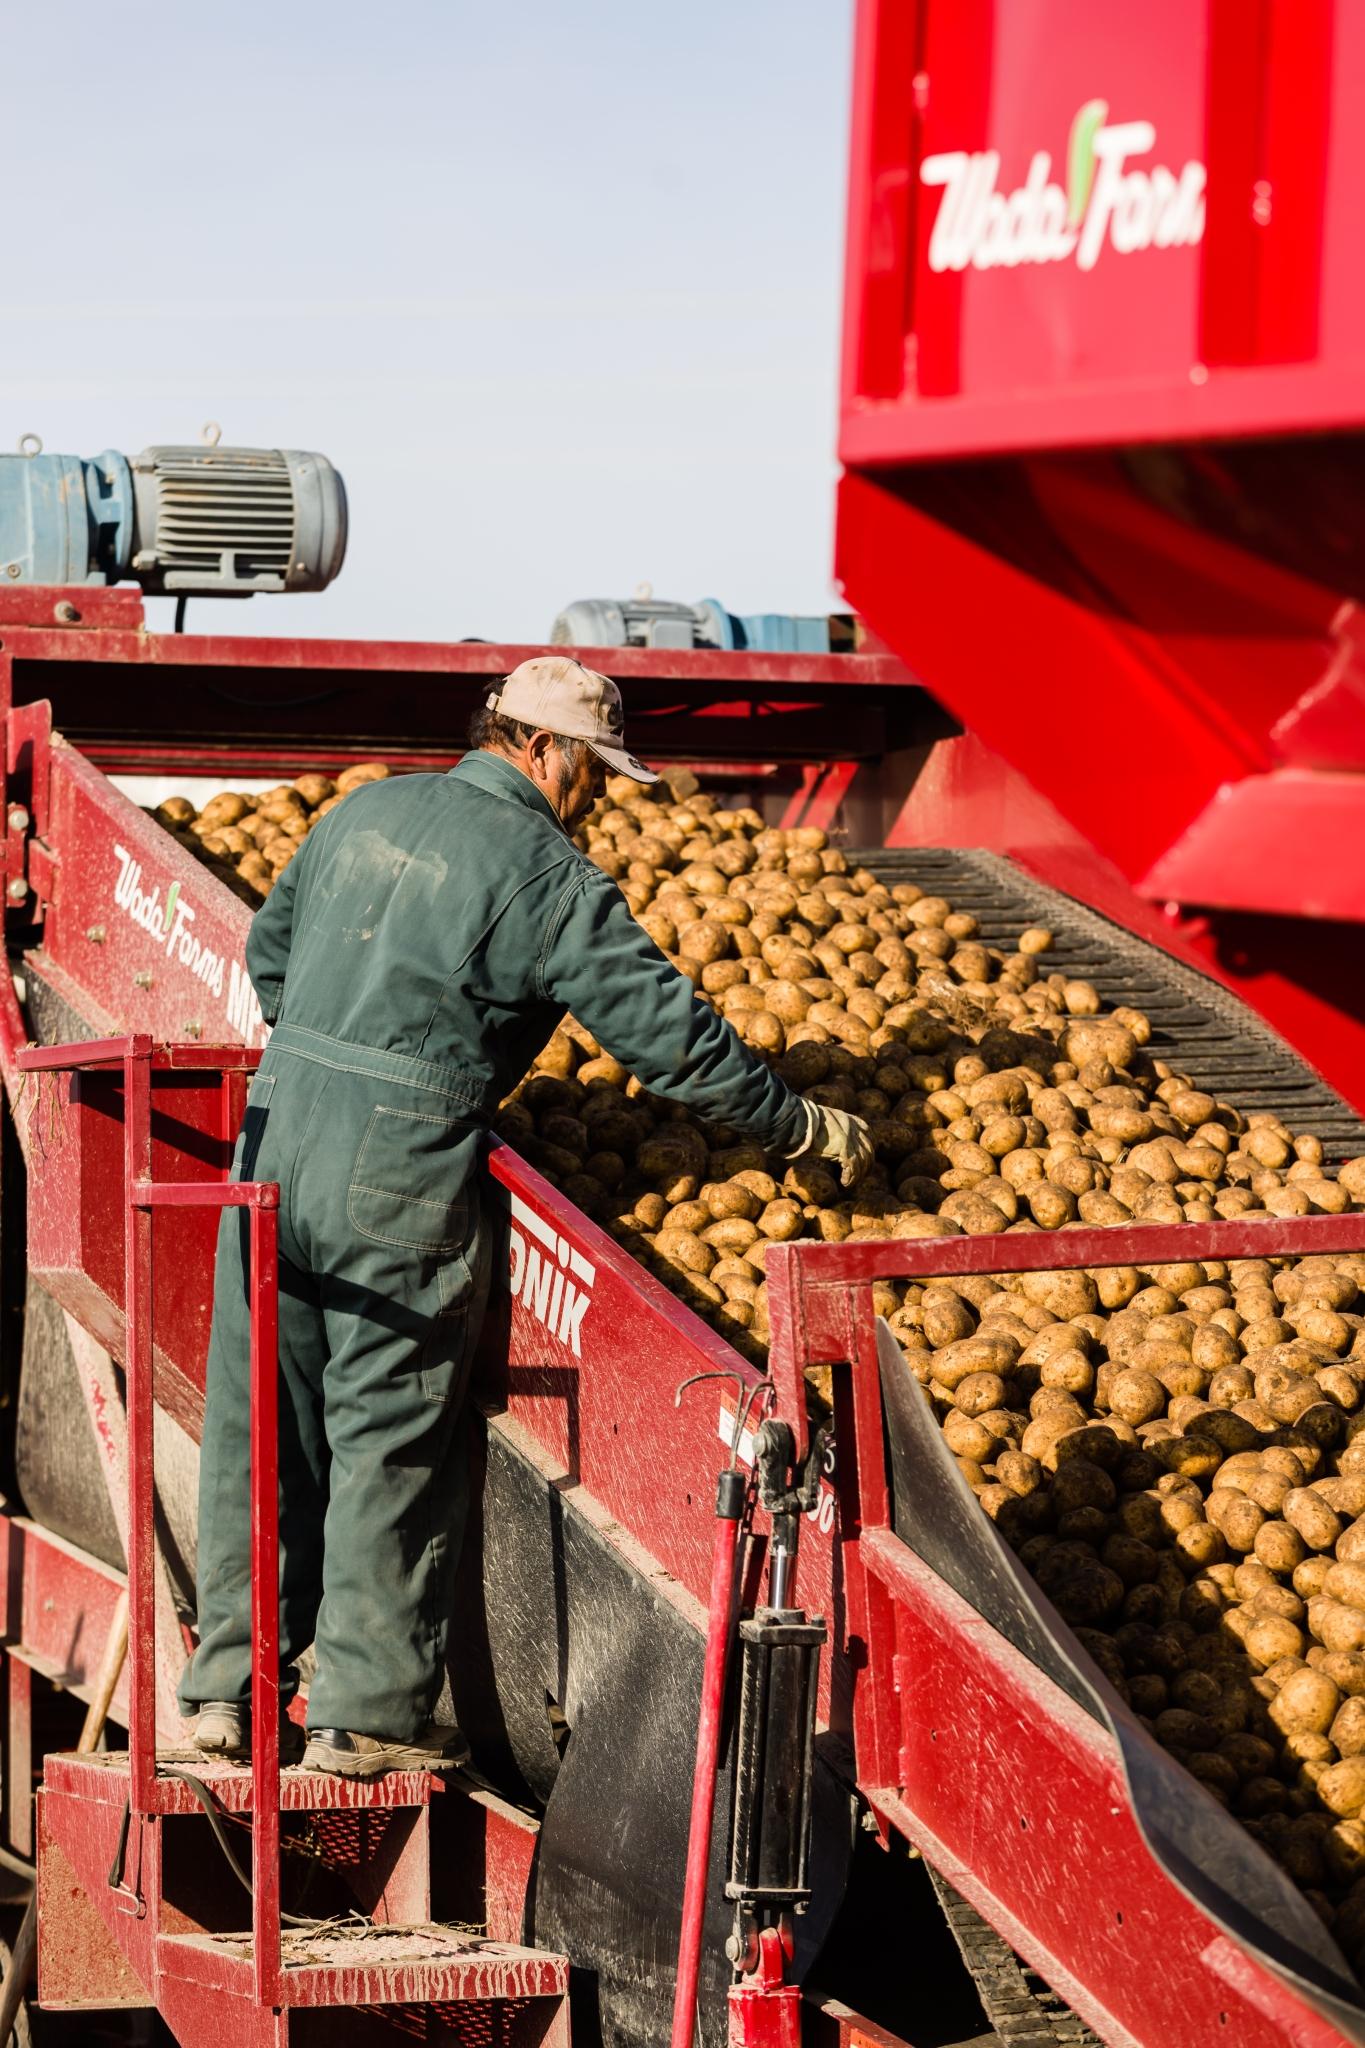 wadafarmsprocessingpotatoes